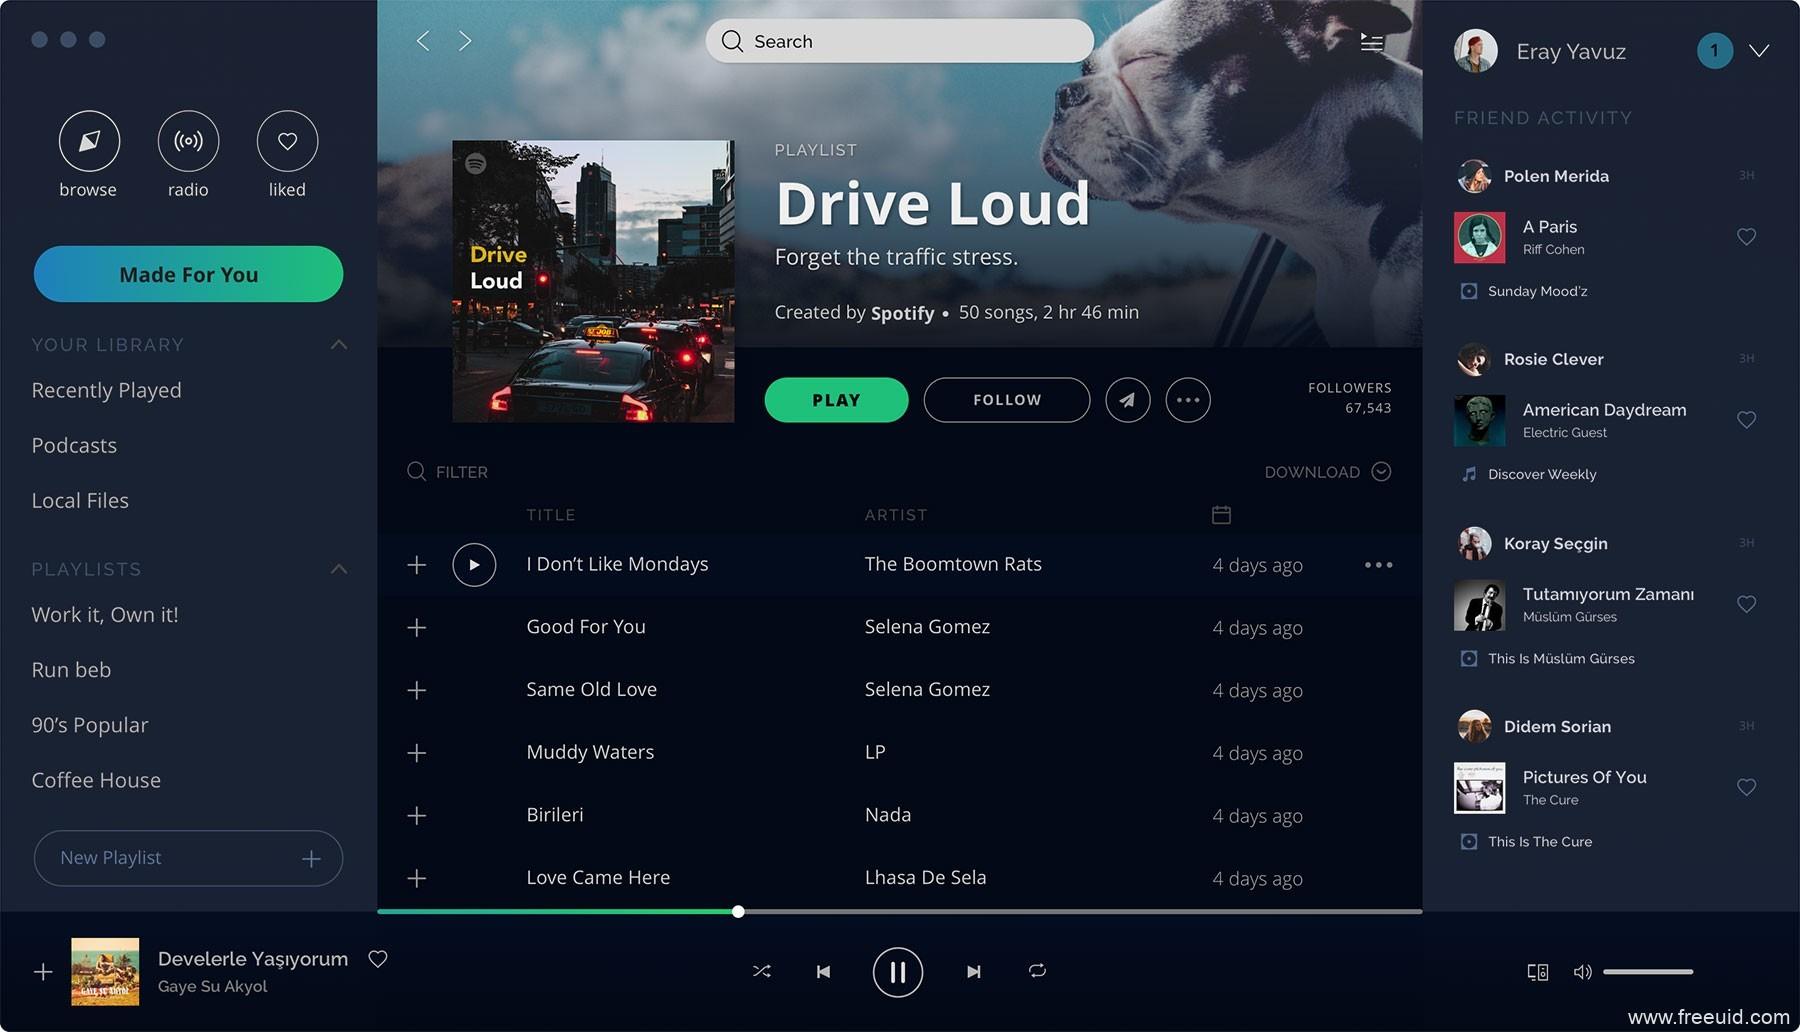 Spotify macOS 概念应用界面、音乐界面、暗色模式界面、sketch源文件下载